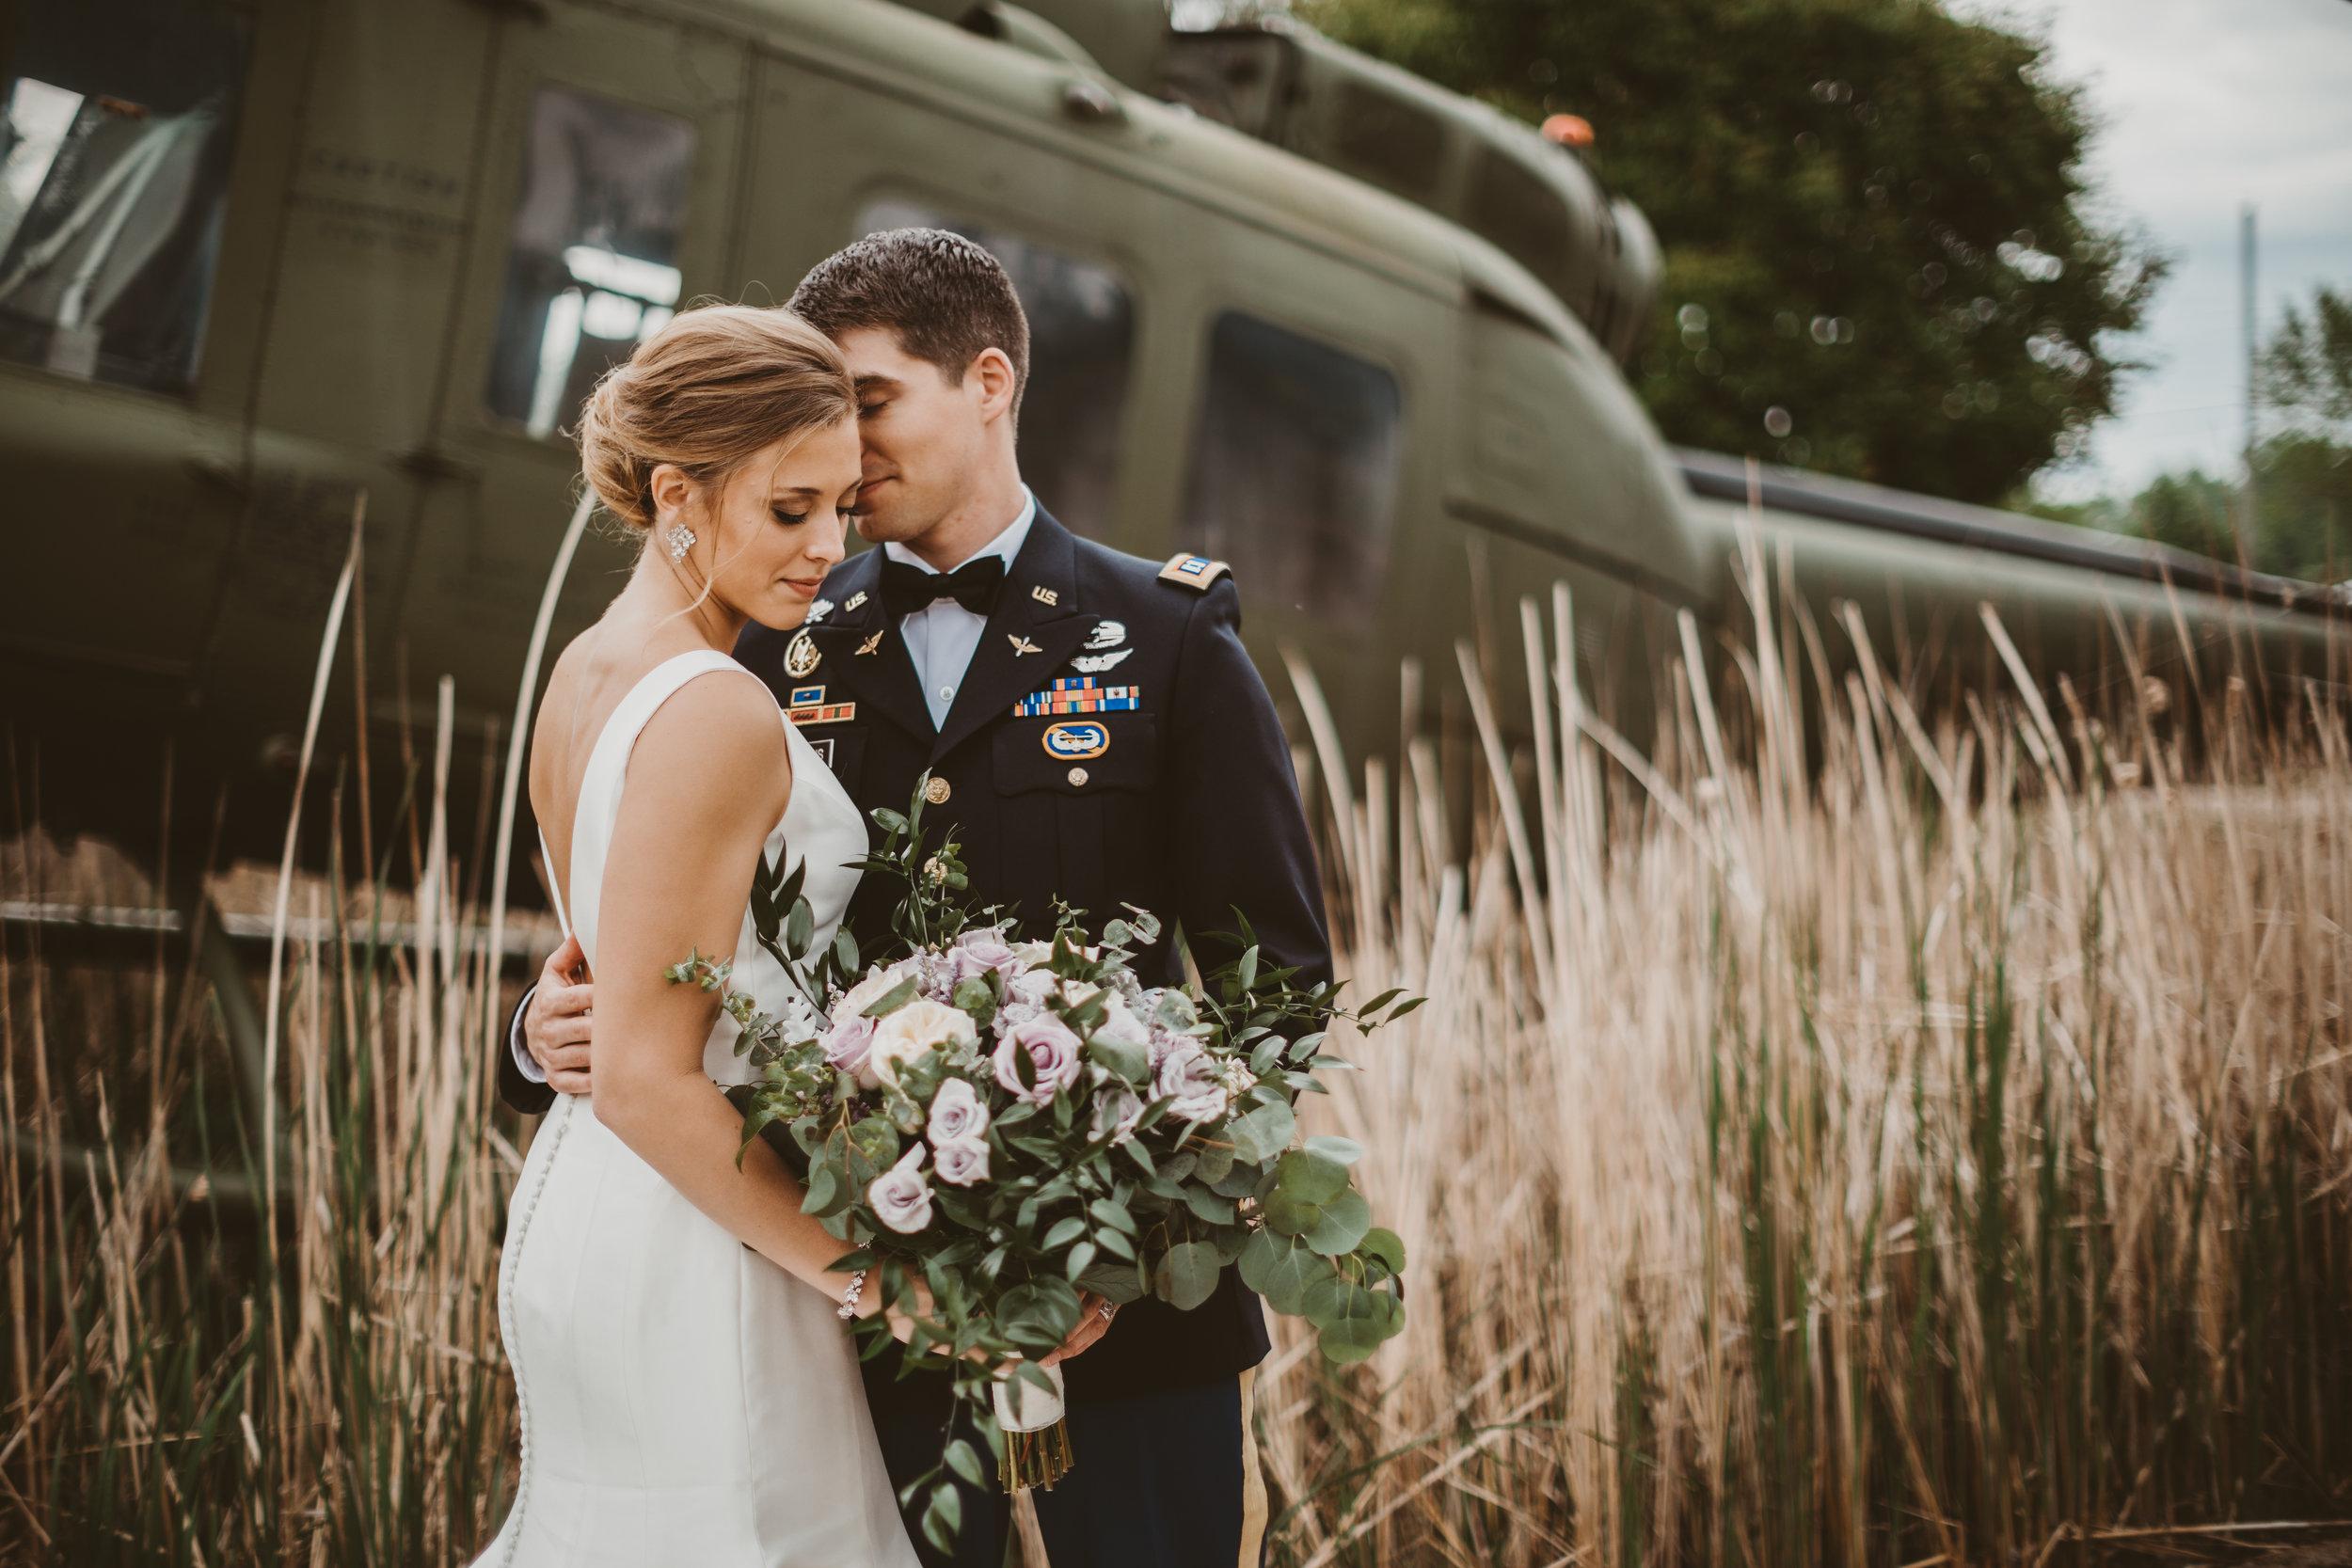 military-bride-and-groom.jpg